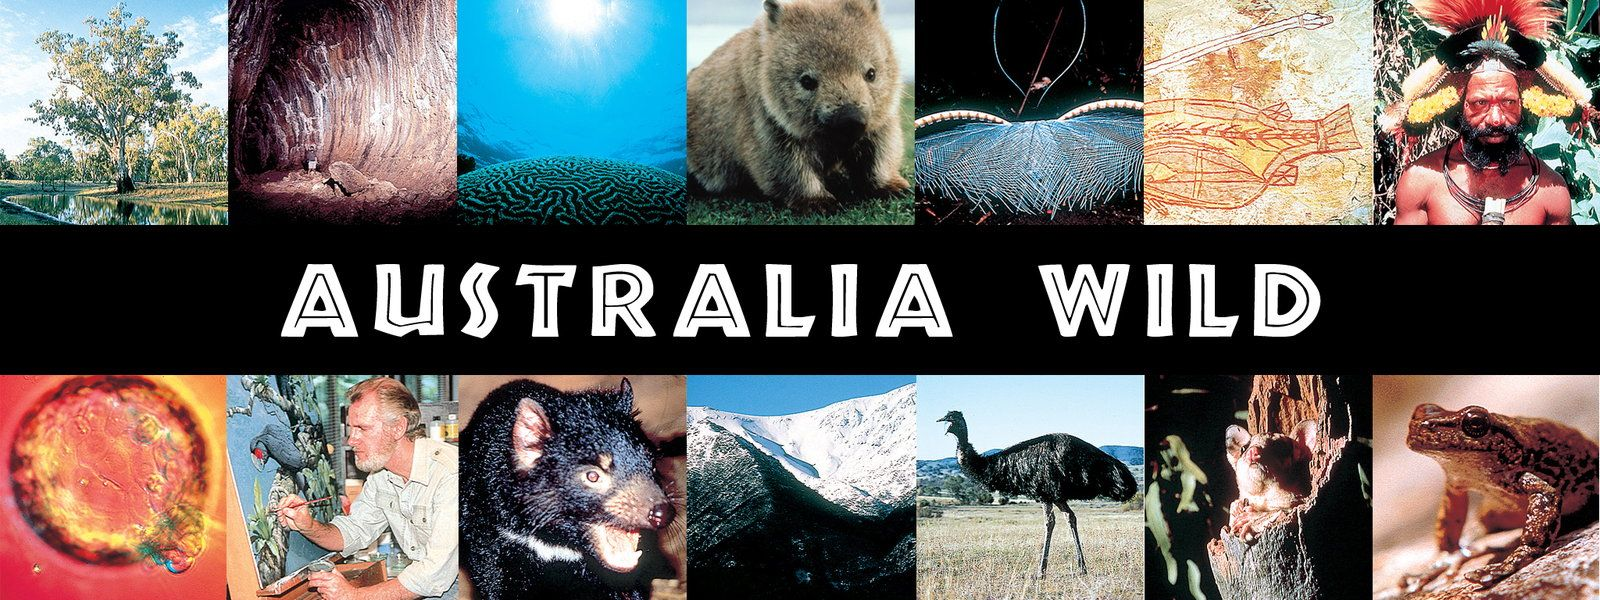 Watch Australia Wild Online Free At Hulu